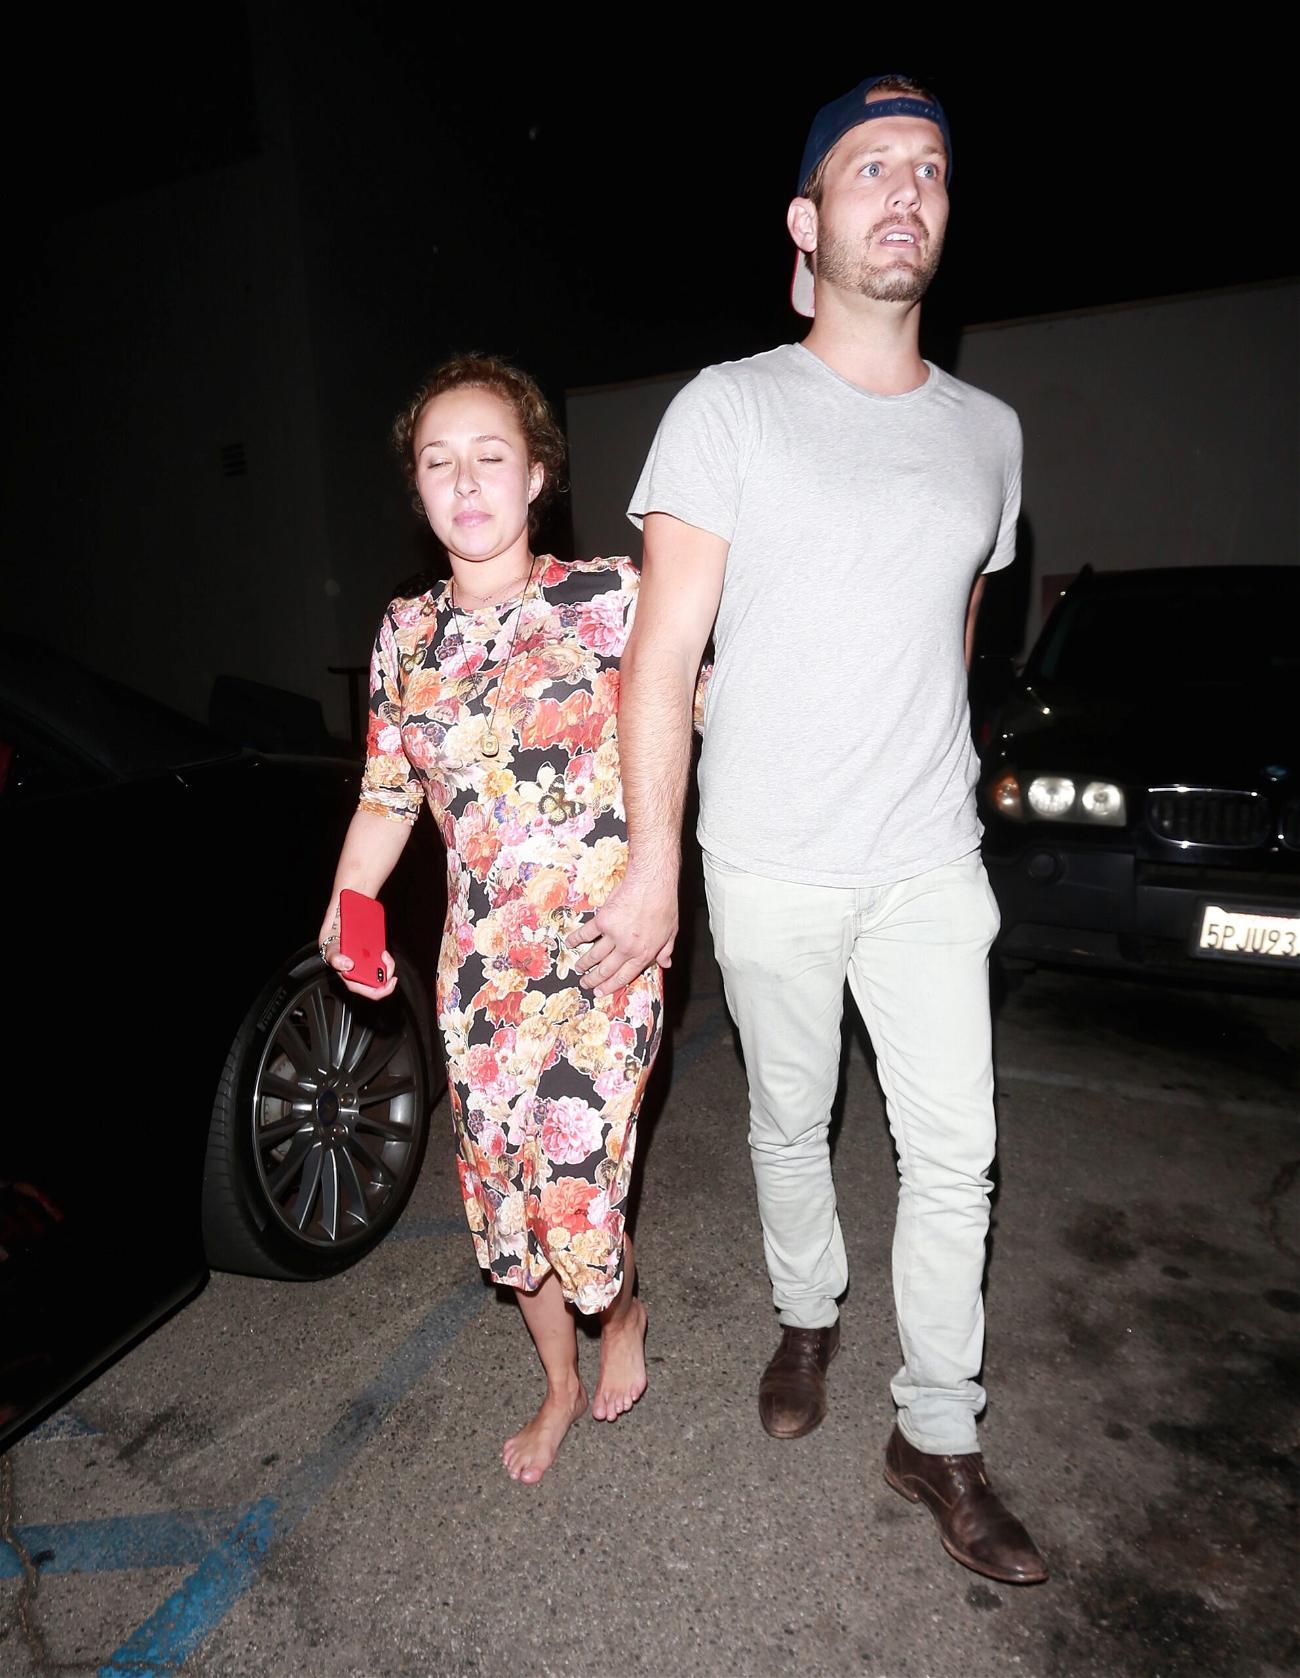 Hayden Panettiere Reunites With Ex-Boyfriend After Domestic Violence Arrests